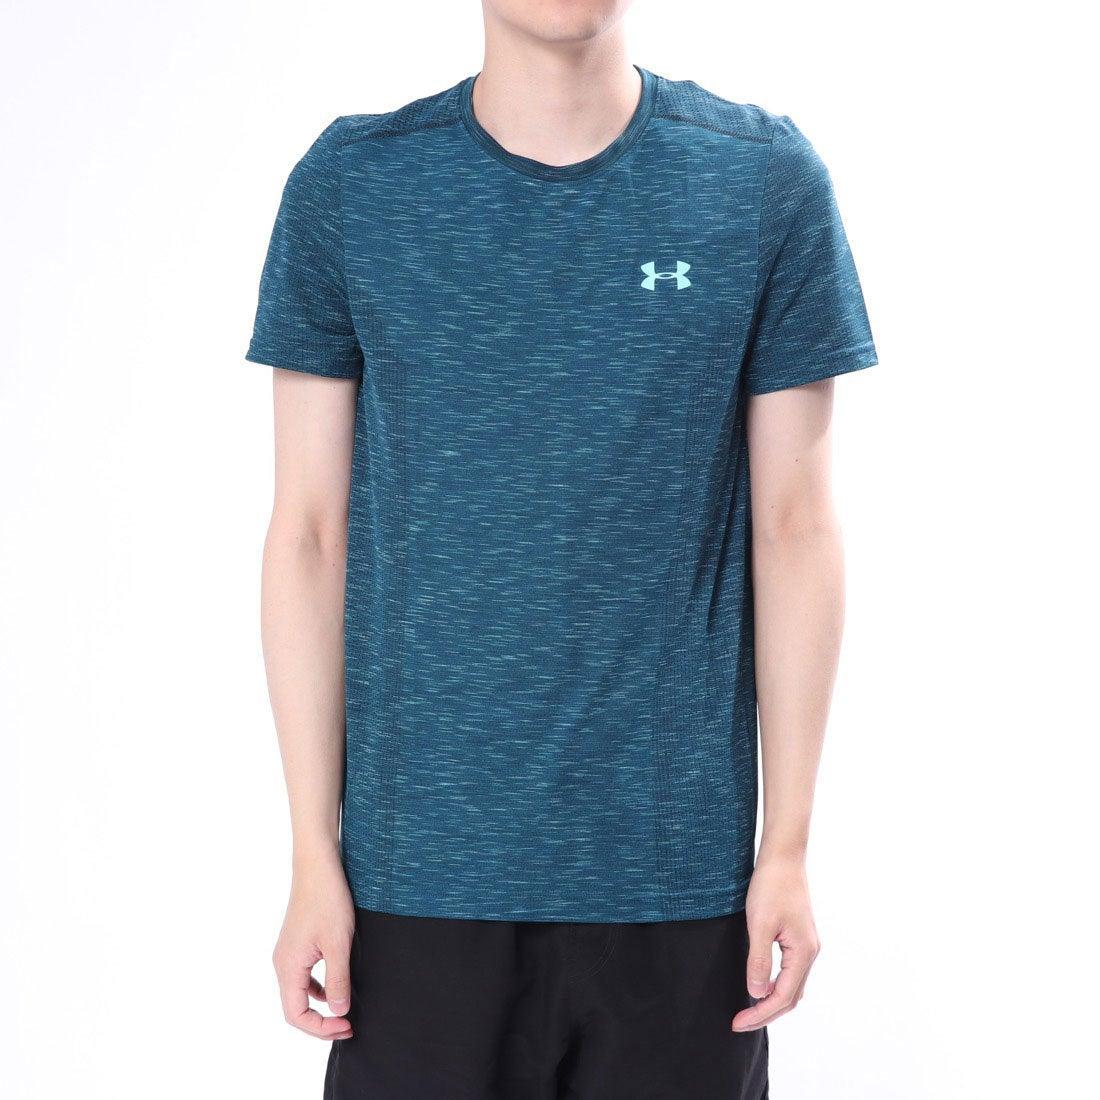 【SALE 30%OFF】アンダーアーマー UNDER ARMOUR メンズ 半袖機能Tシャツ UA THREADBORNE SEAMLESS SS 1289596 メンズ